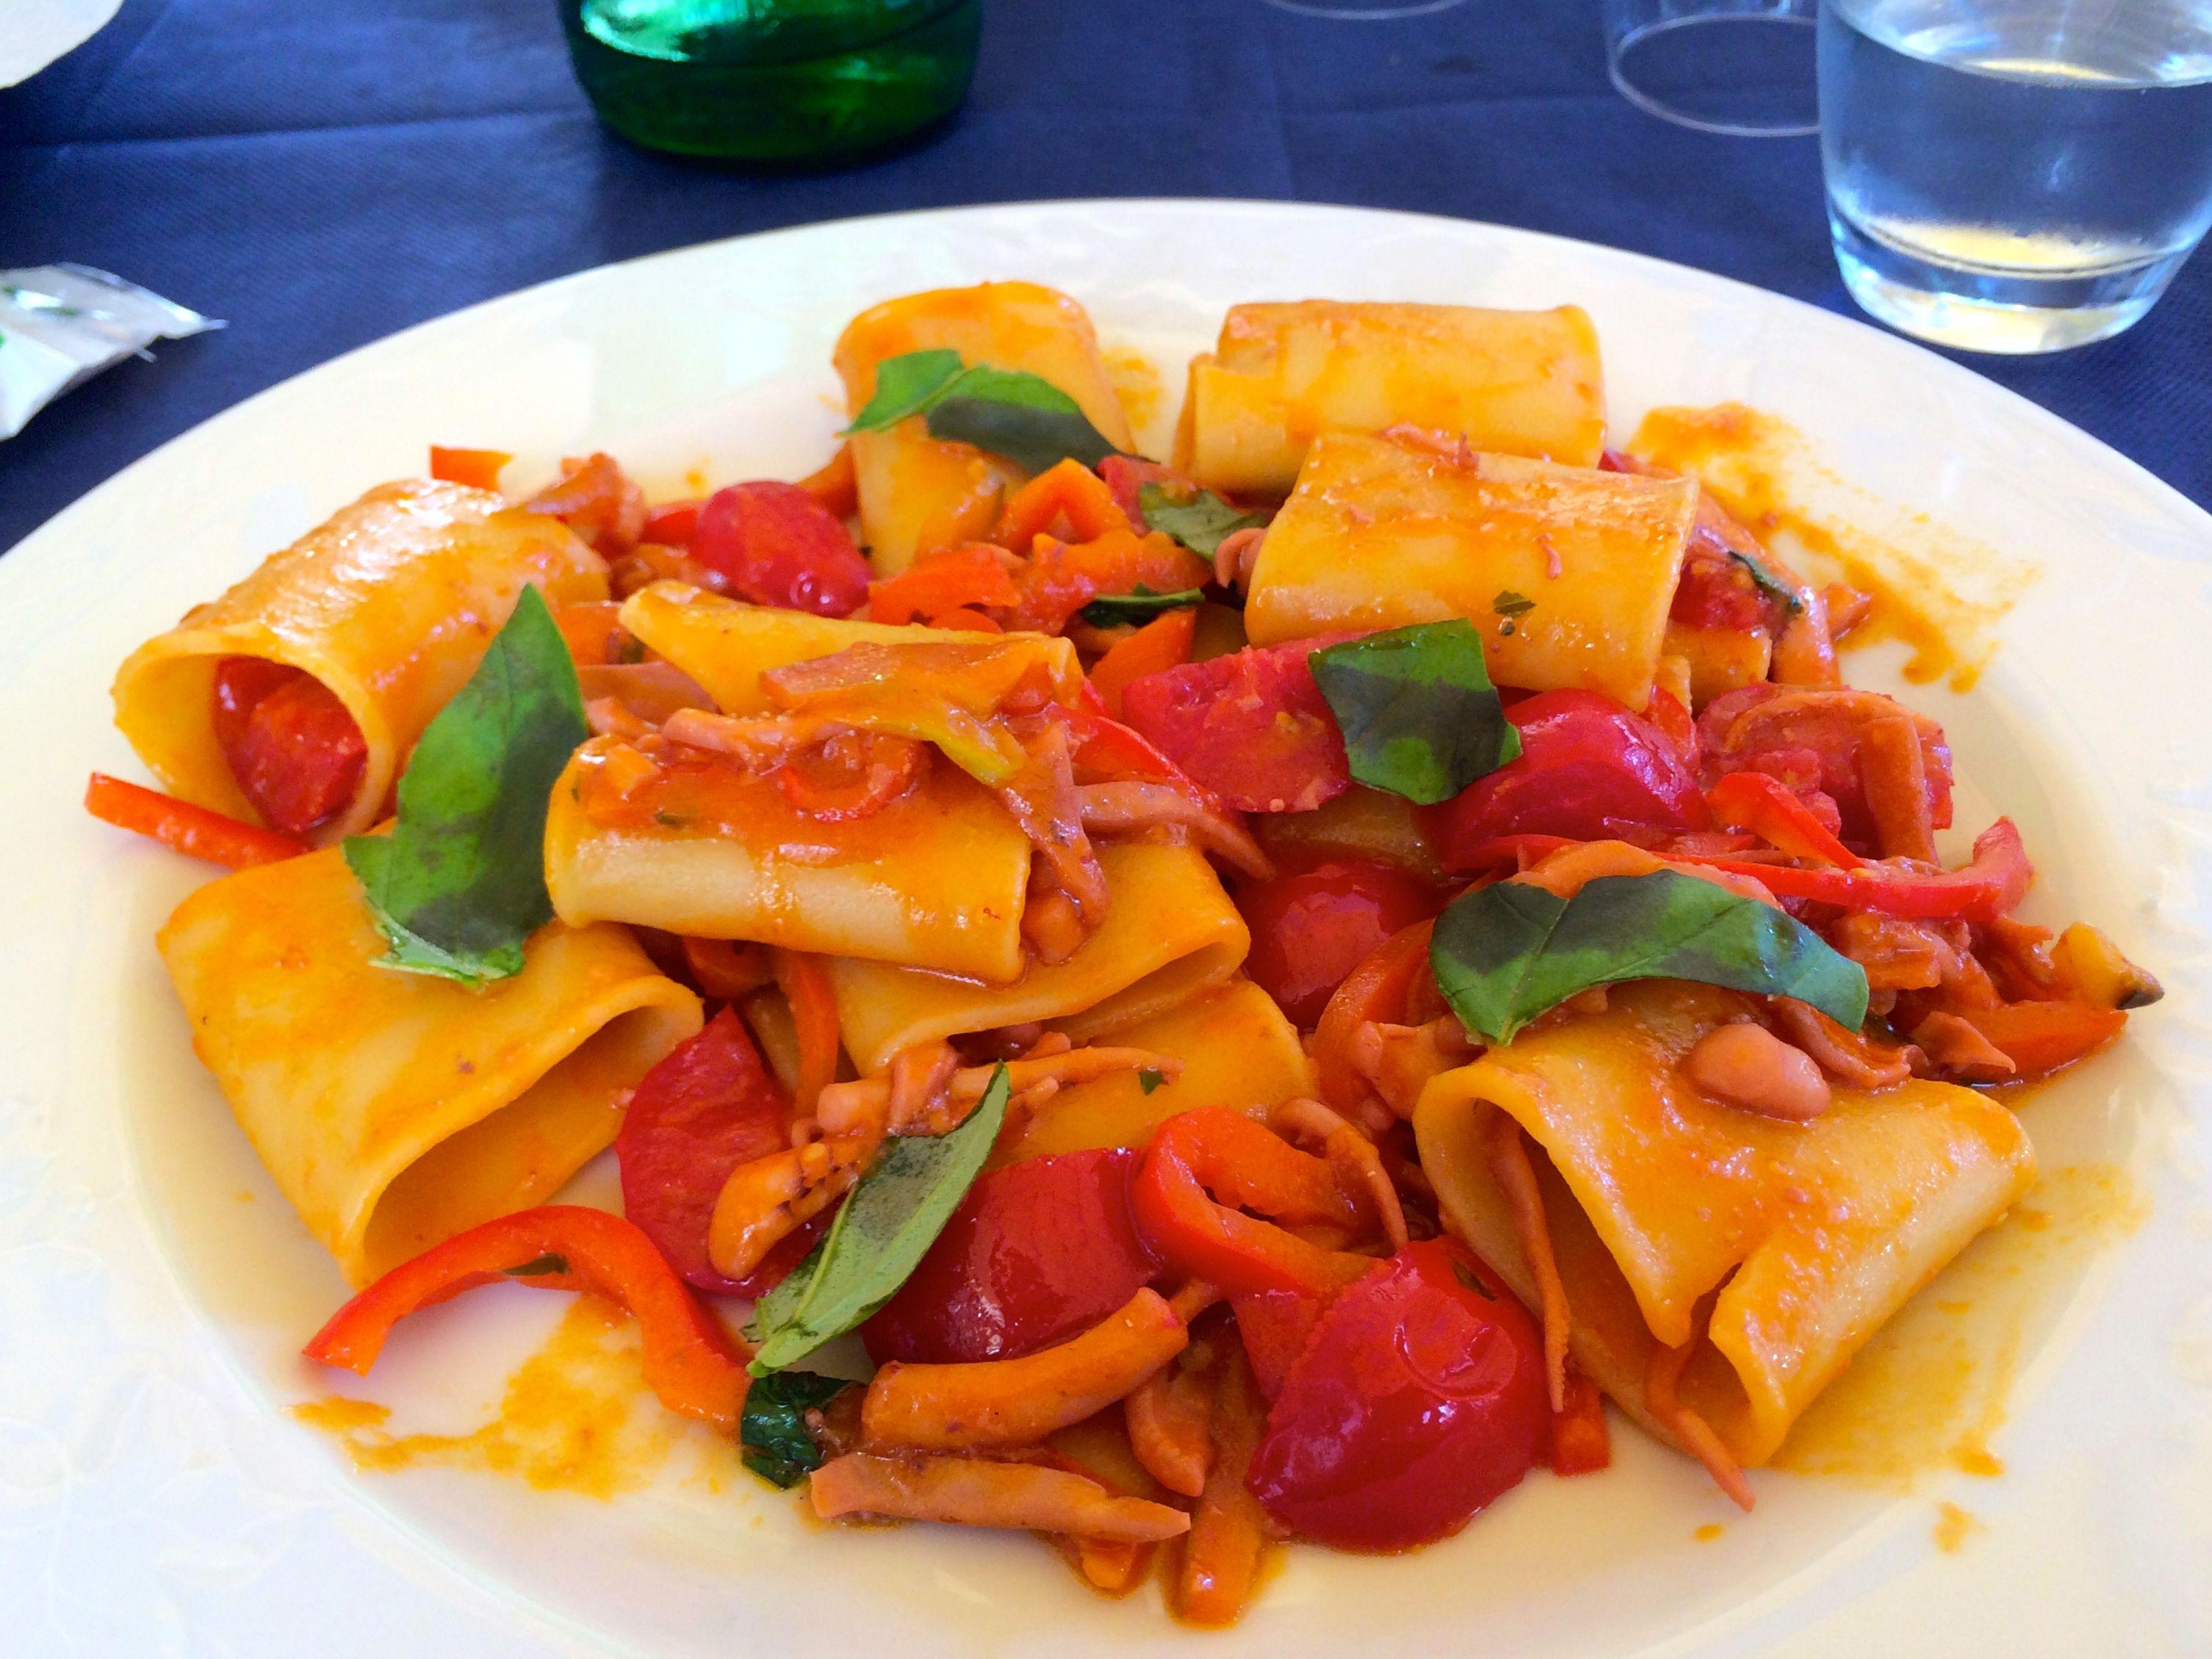 Italian Seafood Pasta with Mussels & Calamari | Recipe ...  |Authentic Italian Seafood Pasta Recipes